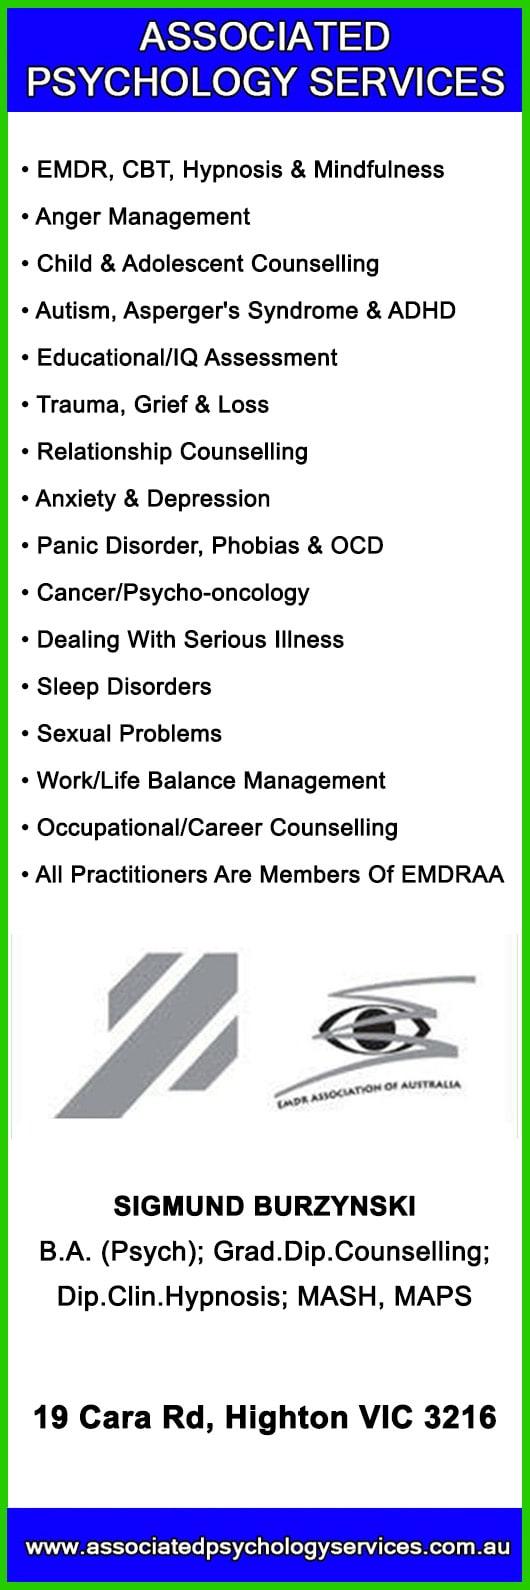 Associated Psychology Services - Psychologist - 19 Cara Rd